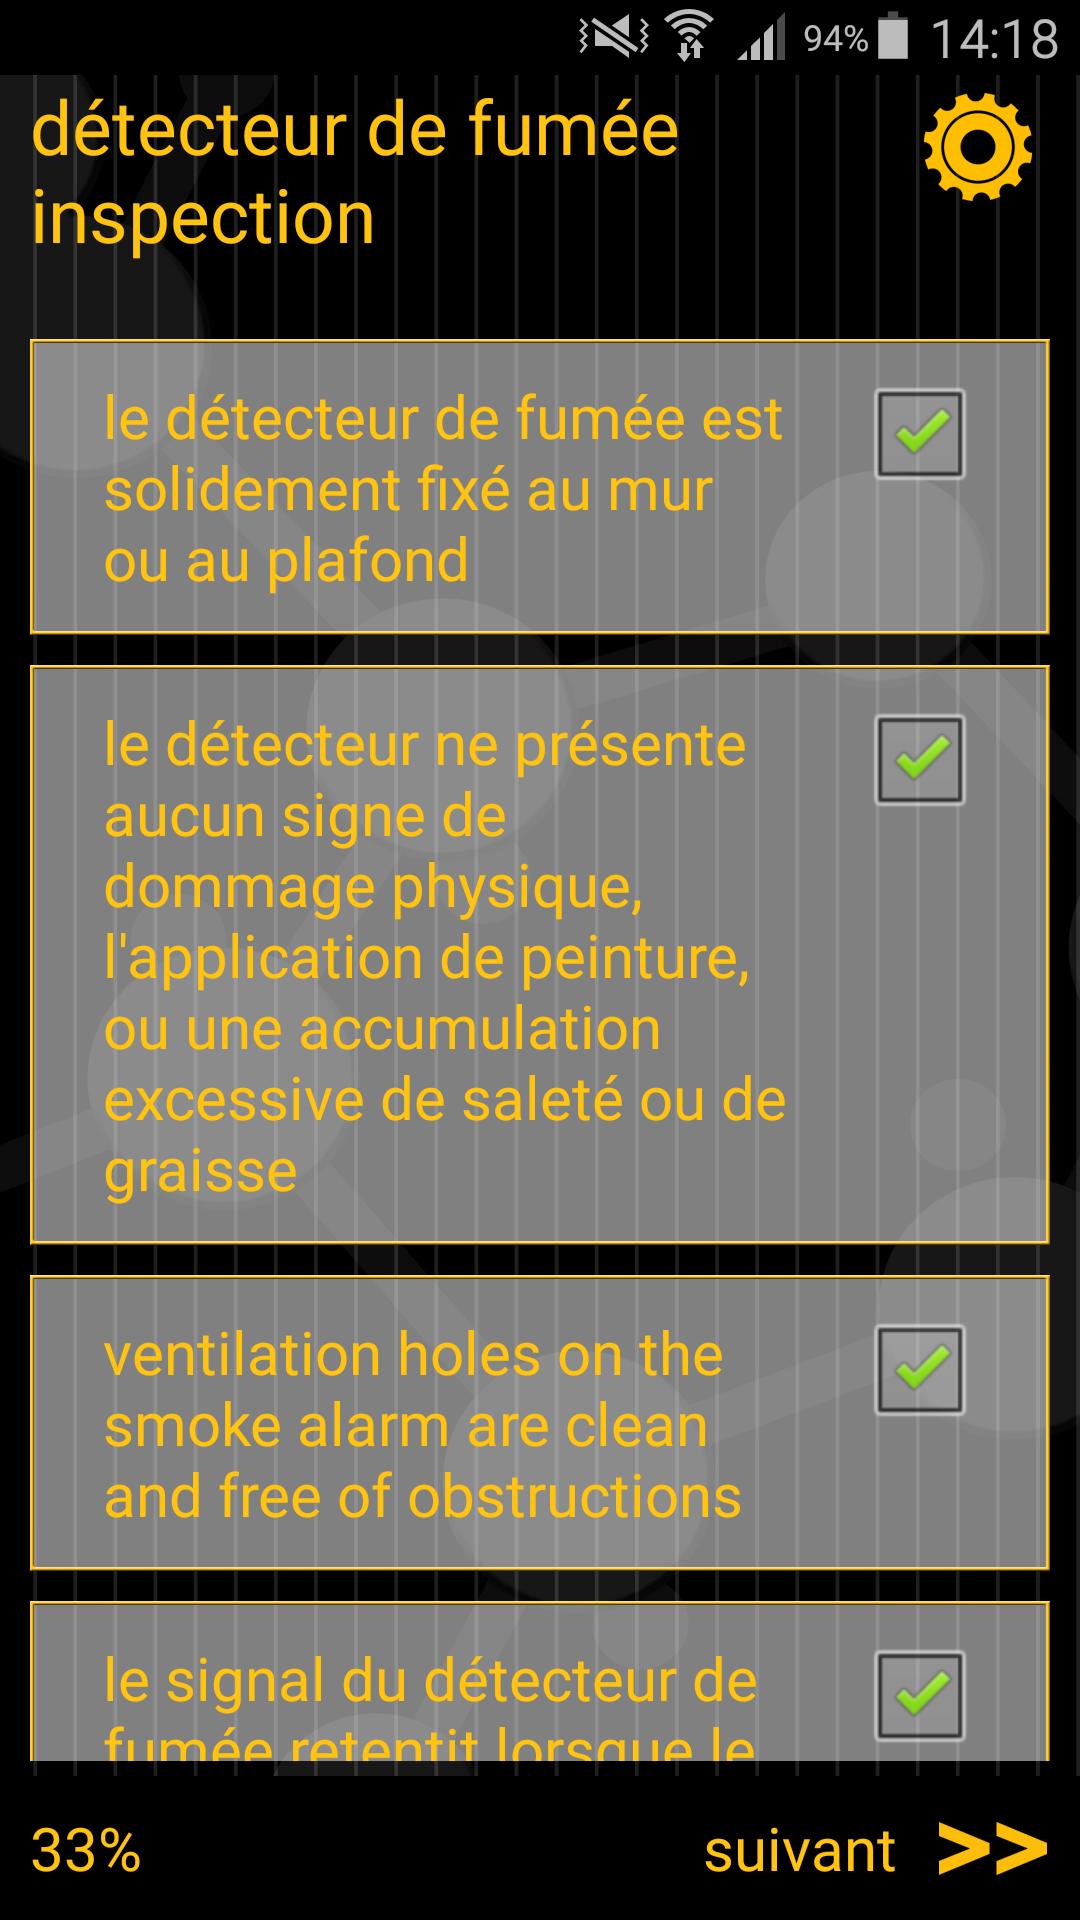 ginstr_app_smokeDetectorInspection_FR_4